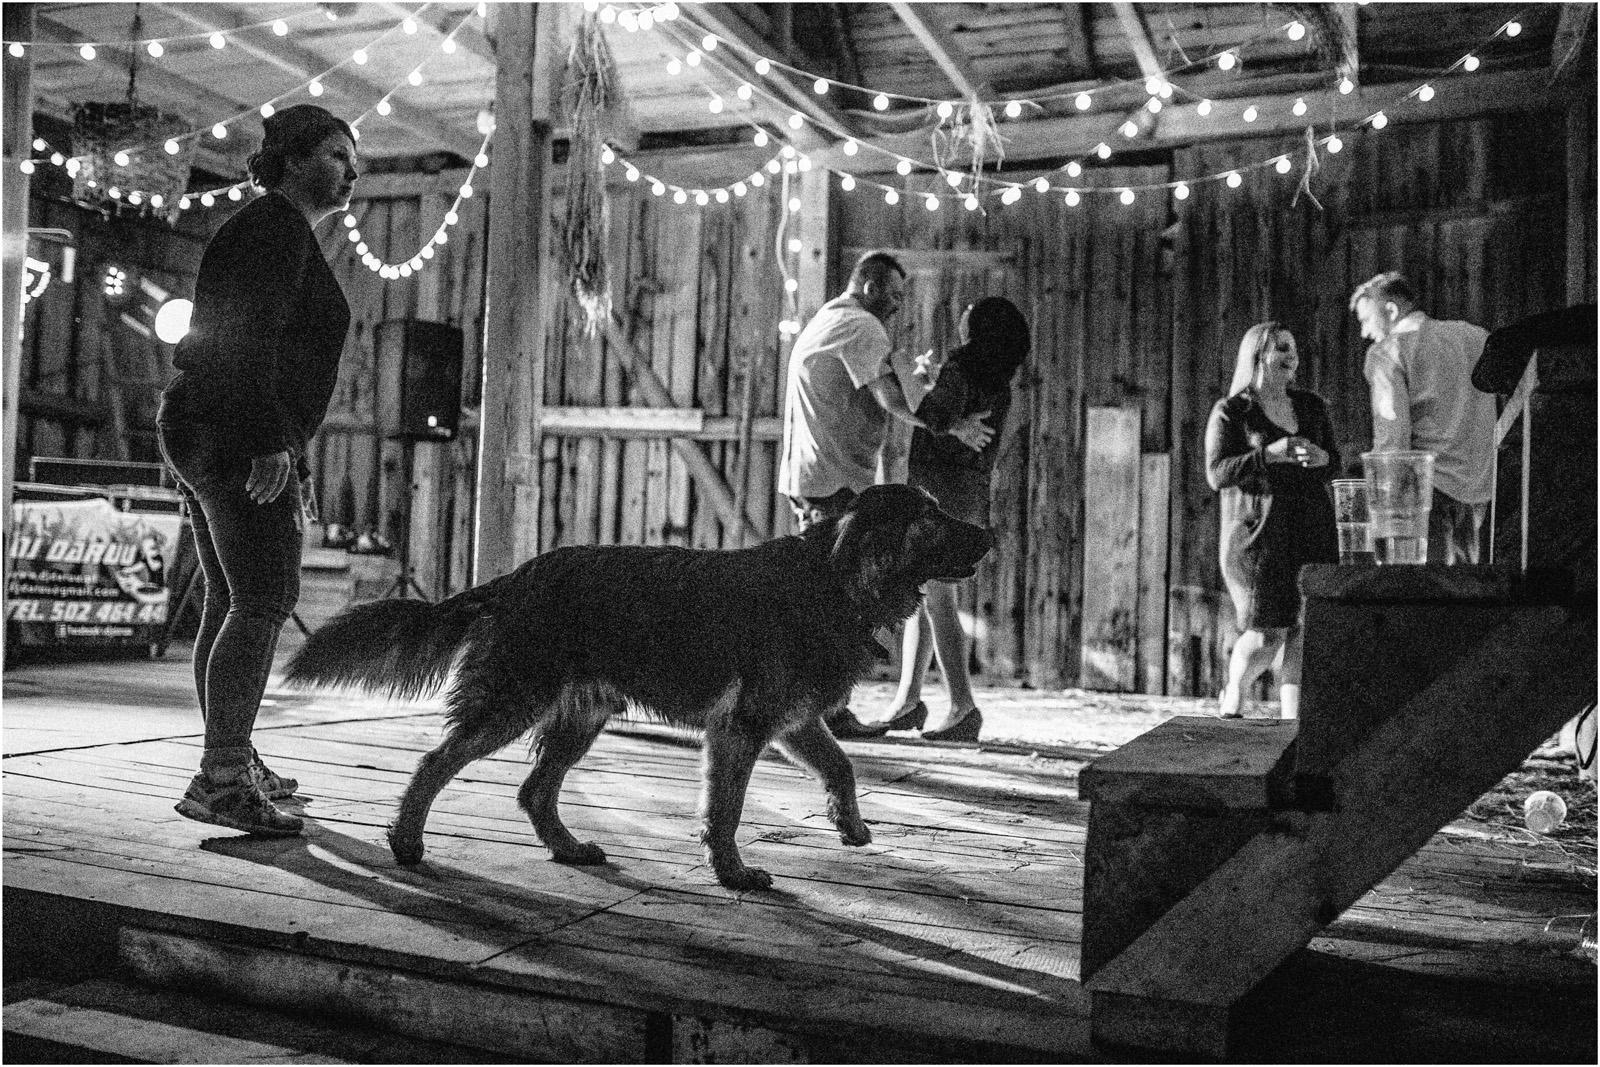 Agatka & Mati | garden party i impreza w stodole 78